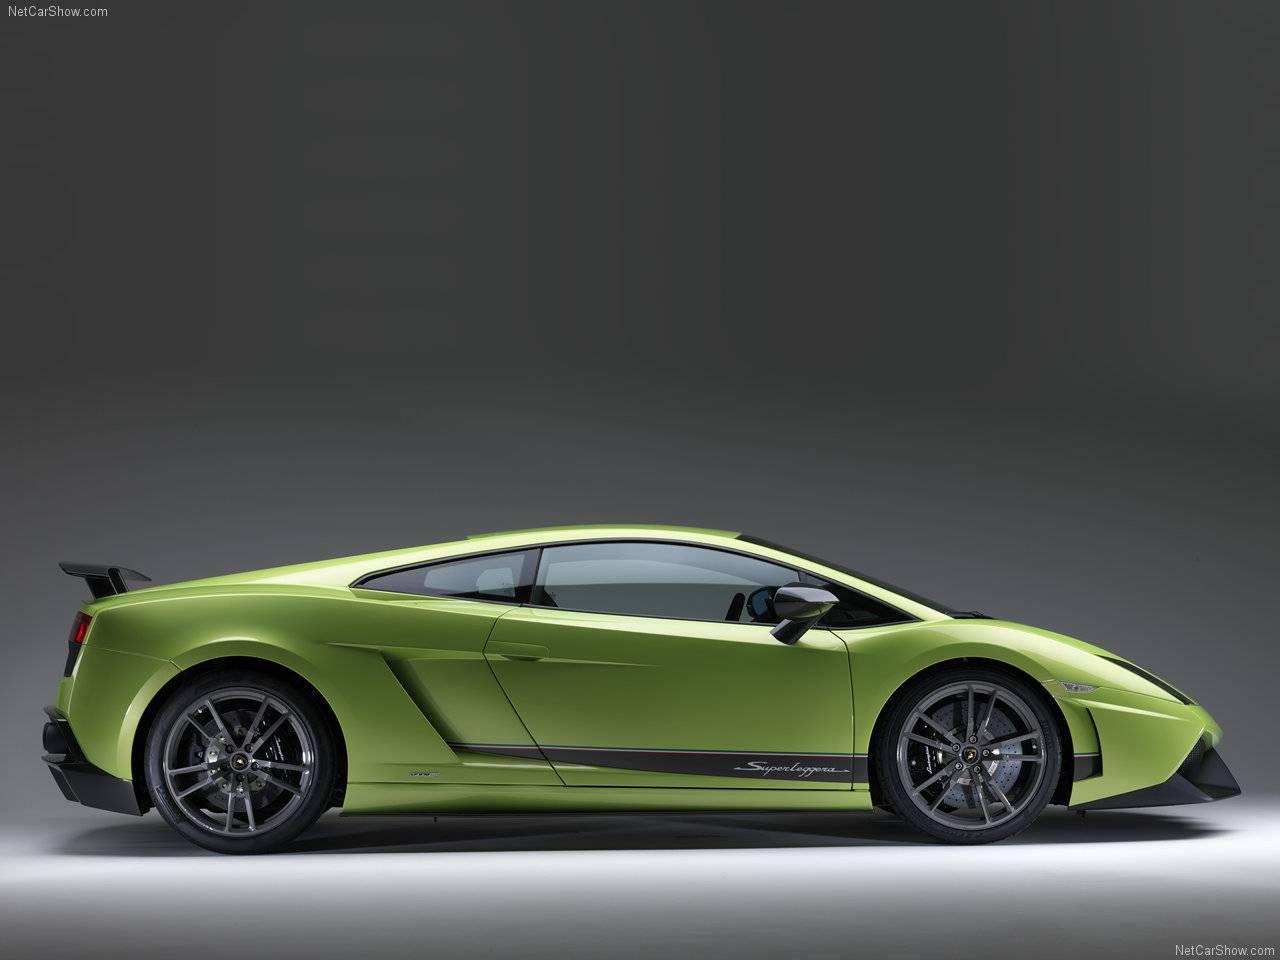 http://1.bp.blogspot.com/_lsyt_wQ2awY/TDiiCFre5LI/AAAAAAAB89M/vC2eZvT55XA/s1600/Lamborghini-Gallardo_LP570-4_Superleggera_2011_1280x960_wallpaper_05.jpg